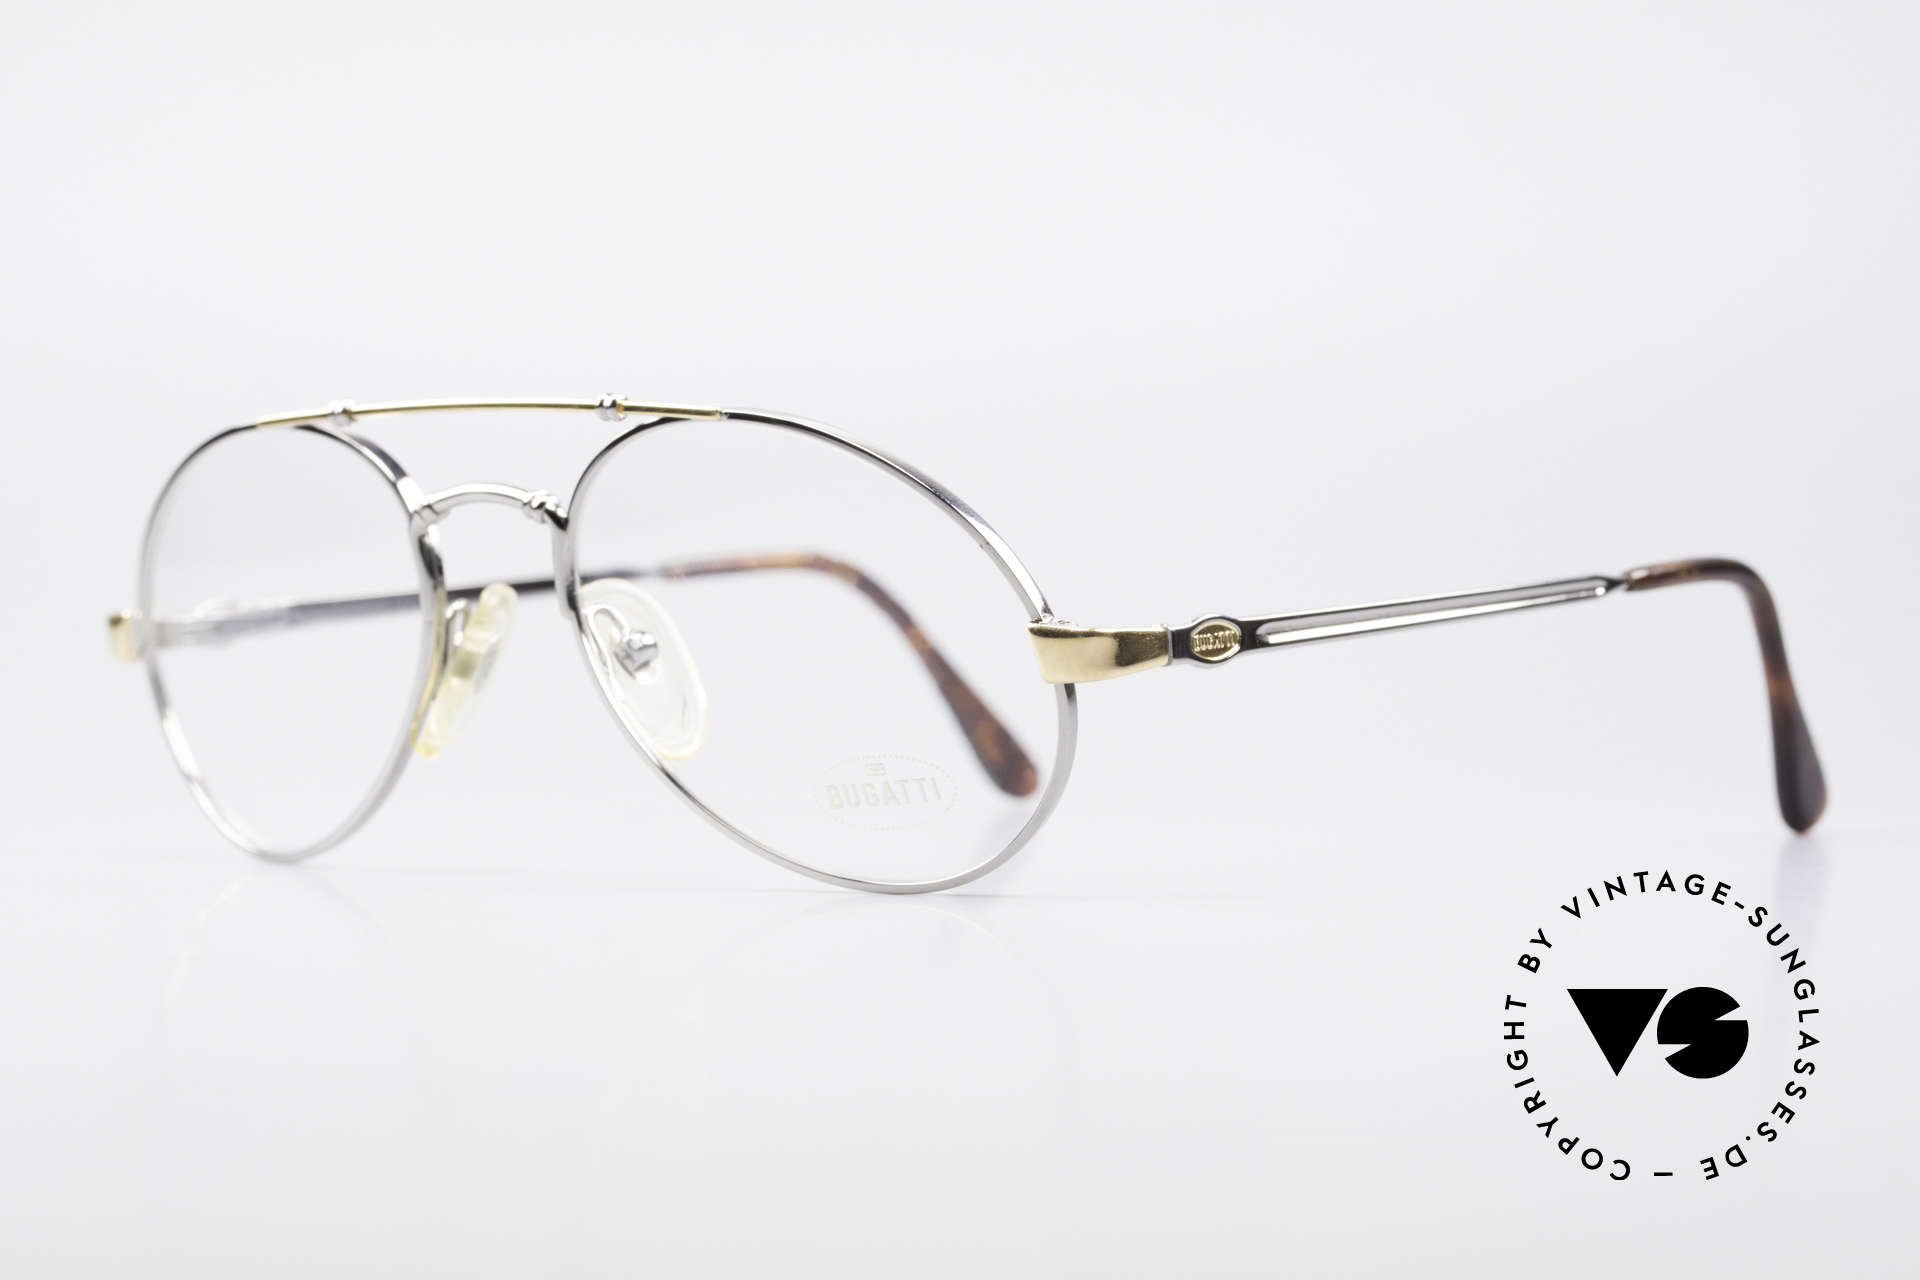 Bugatti 18526 Men's 80's Luxury Eyeglasses, flexible spring temples & top-notch craftmanship, Made for Men